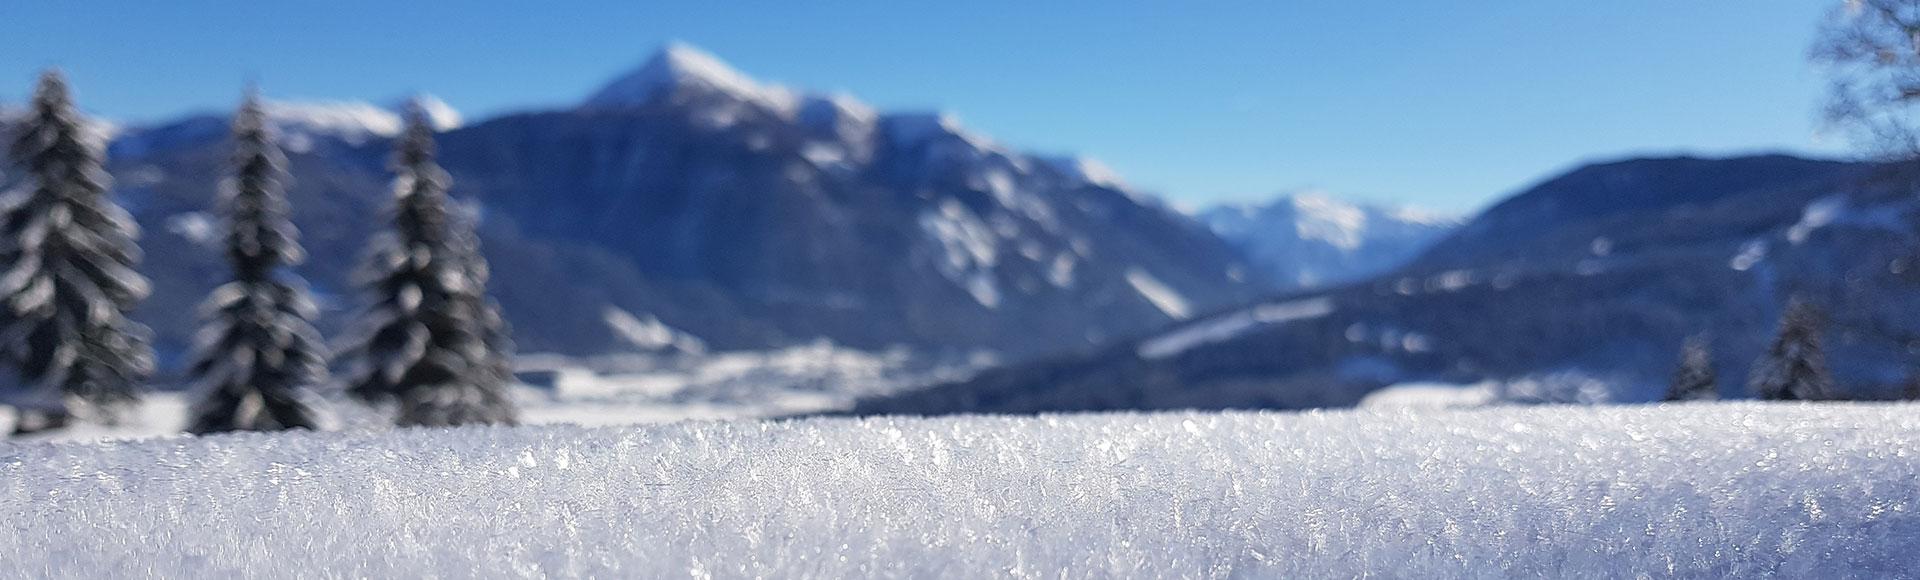 Winter Special Hotel Alpenwelt Flachau 2